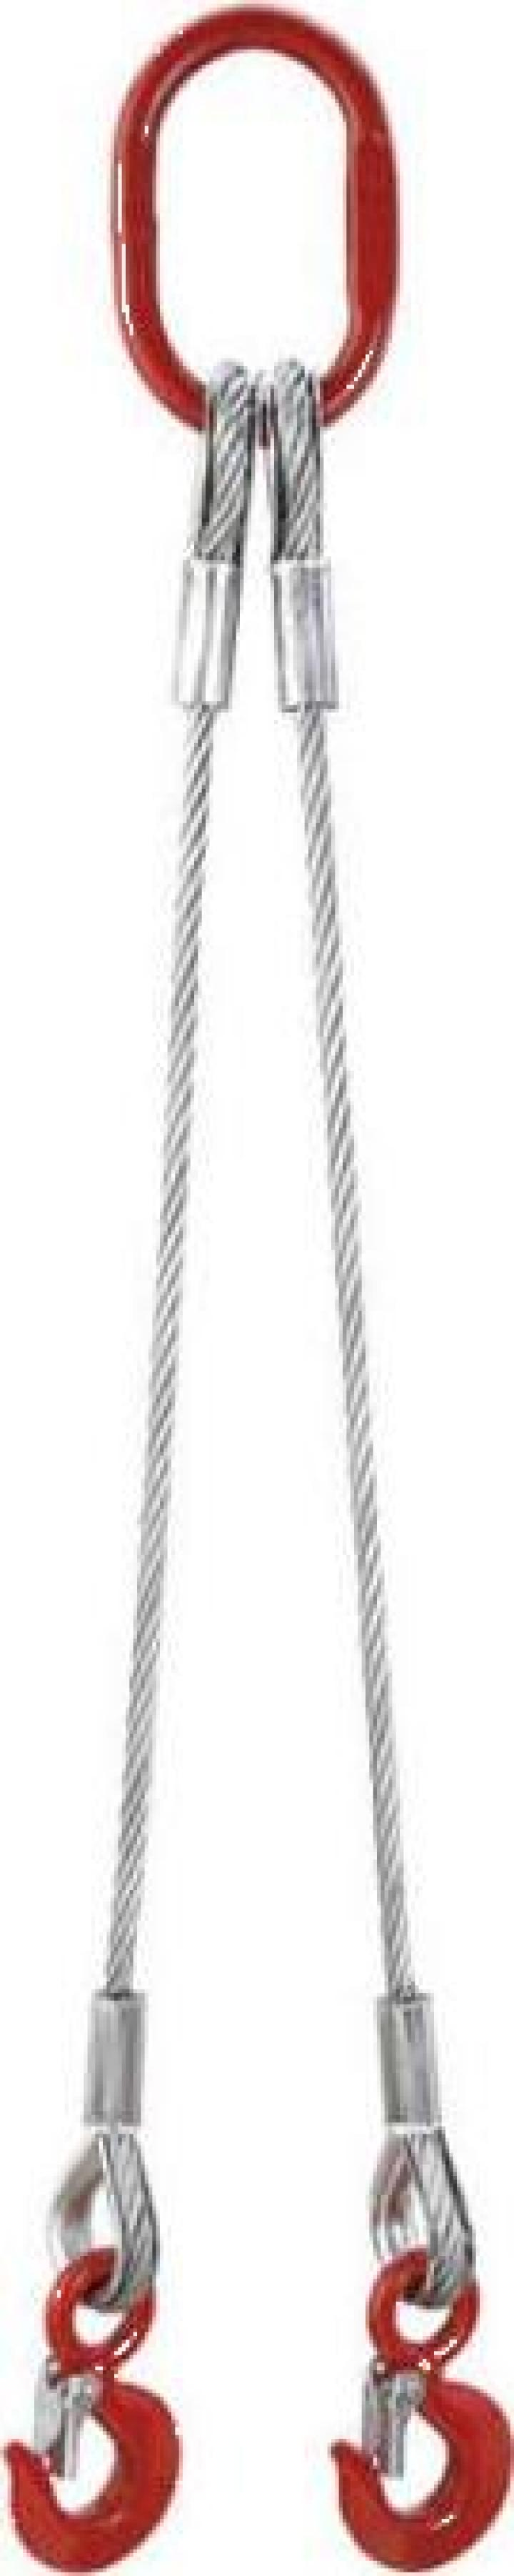 Lant ridicare 2 cabluri si 2 carlige AN2G/12/1